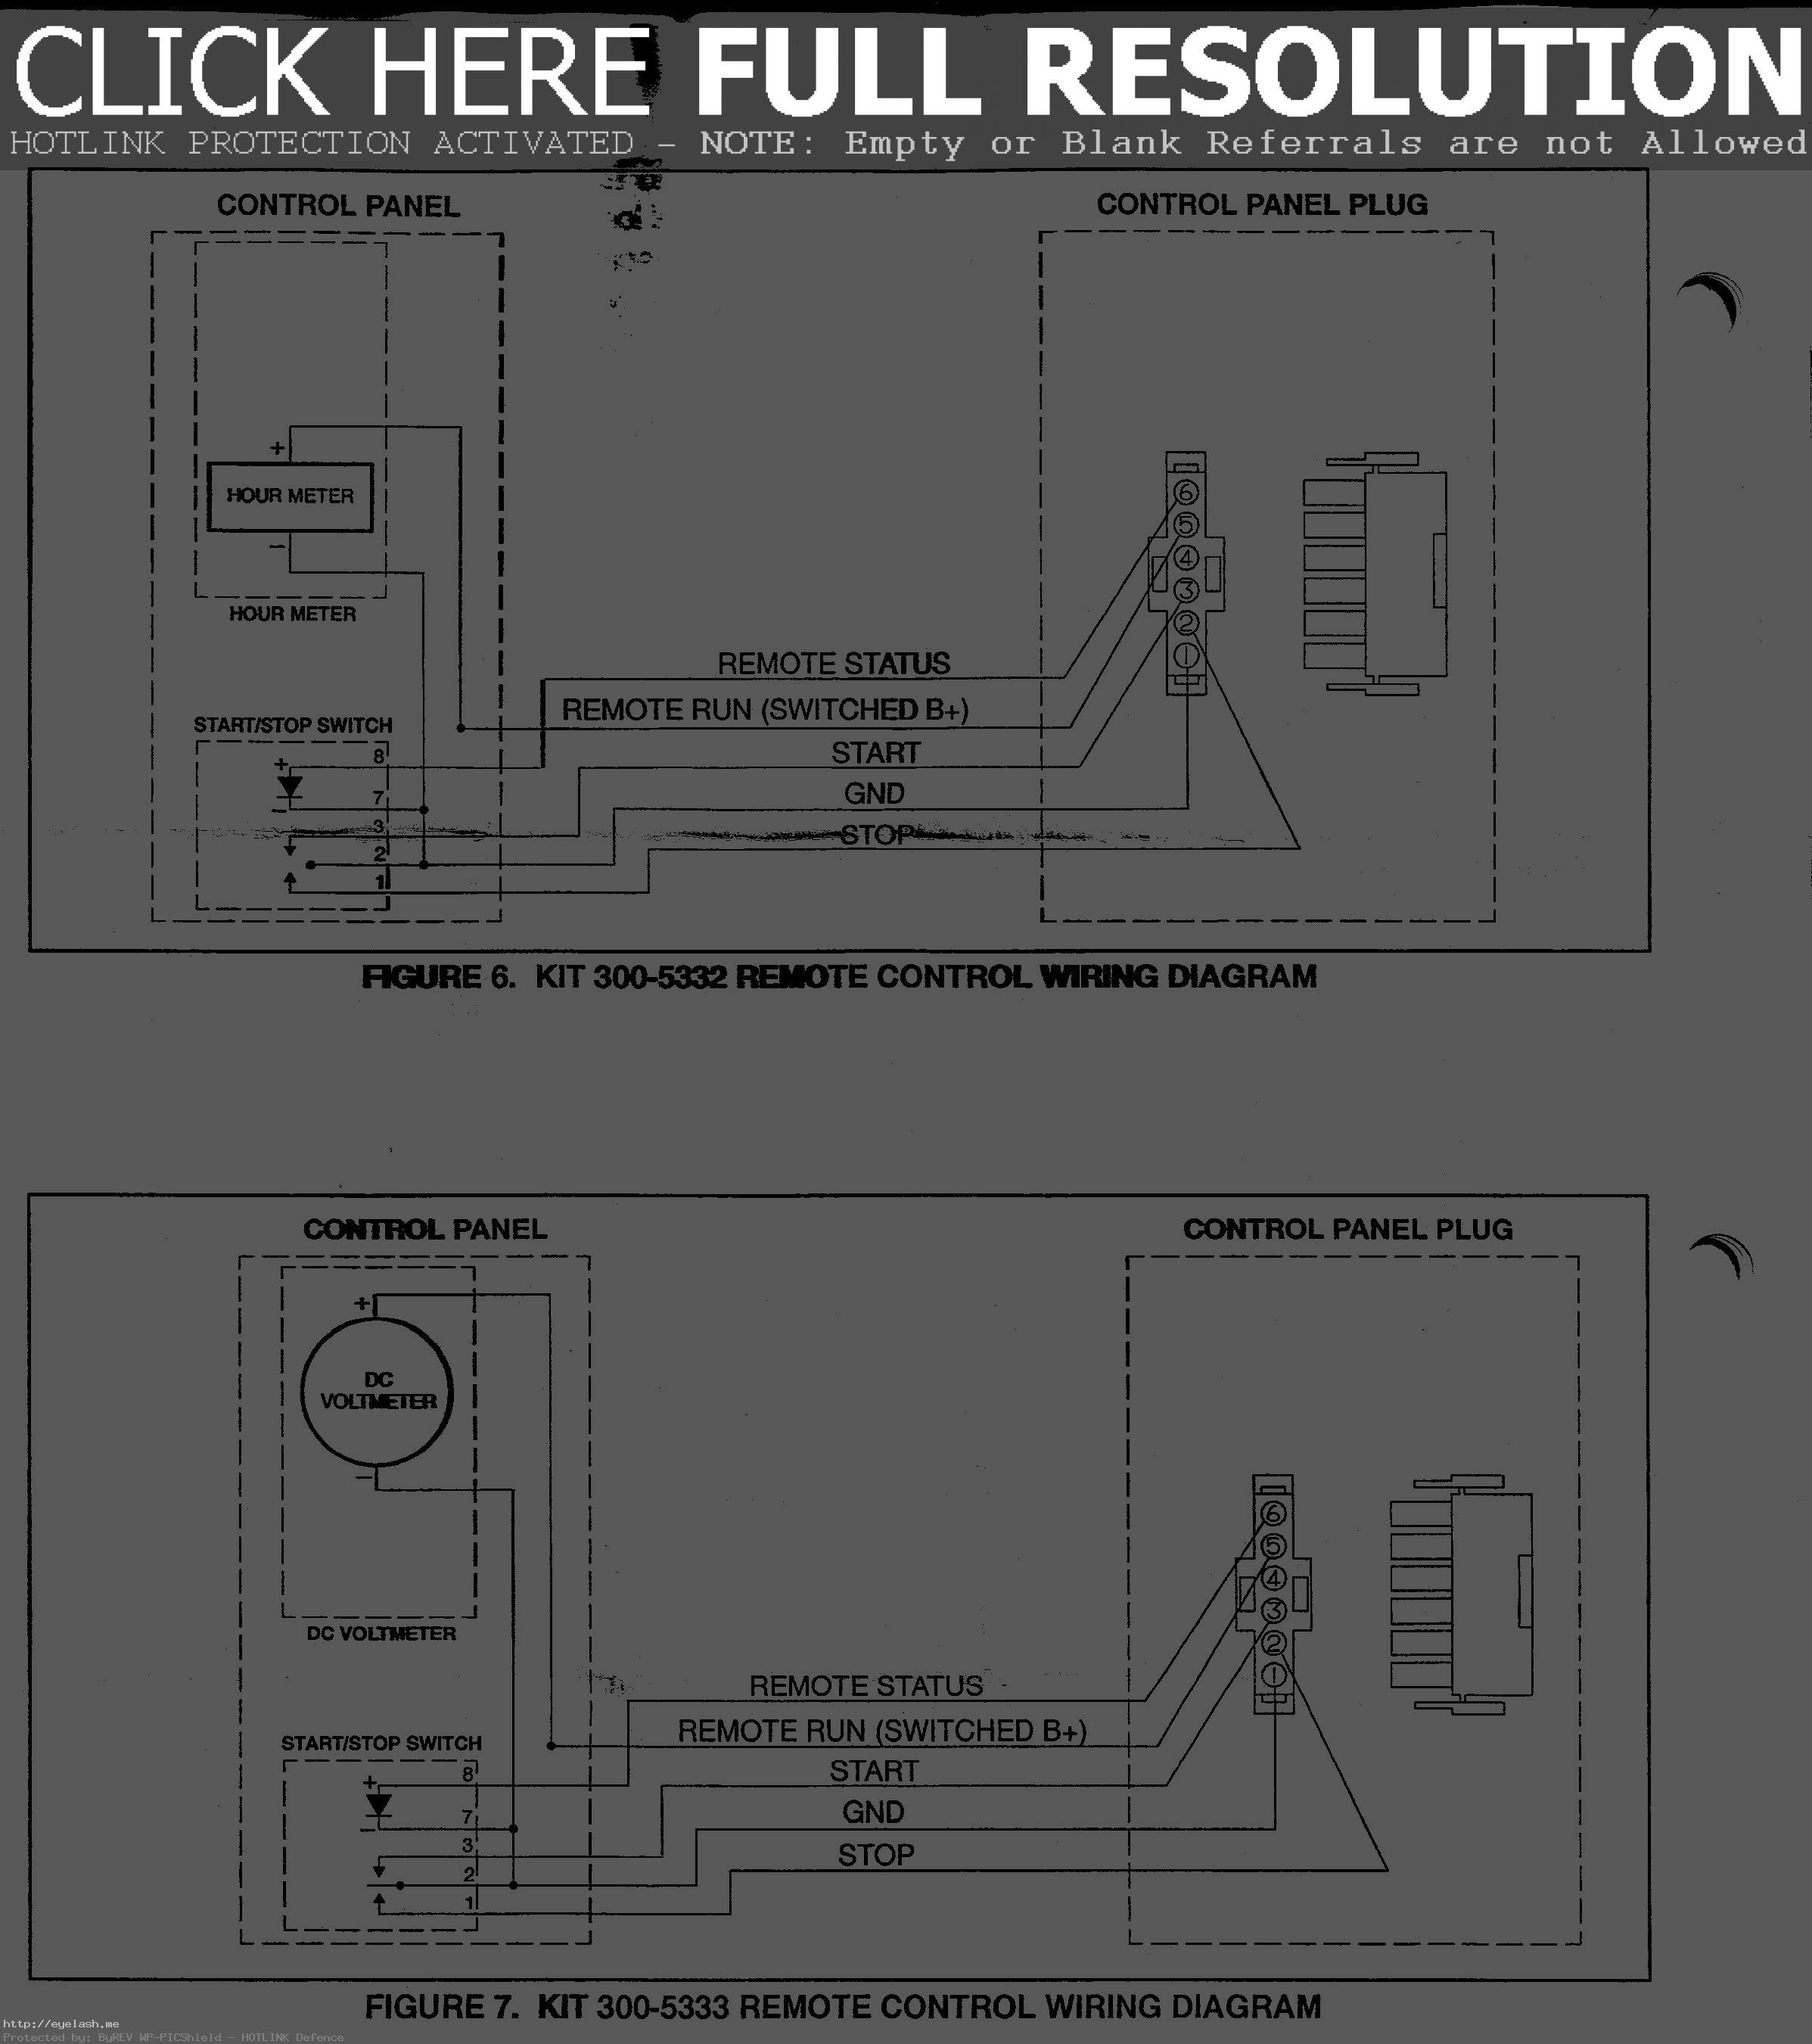 Strange Wiring Diagram For Onan Gen Wiring Diagram Wiring Cloud Grayisramohammedshrineorg